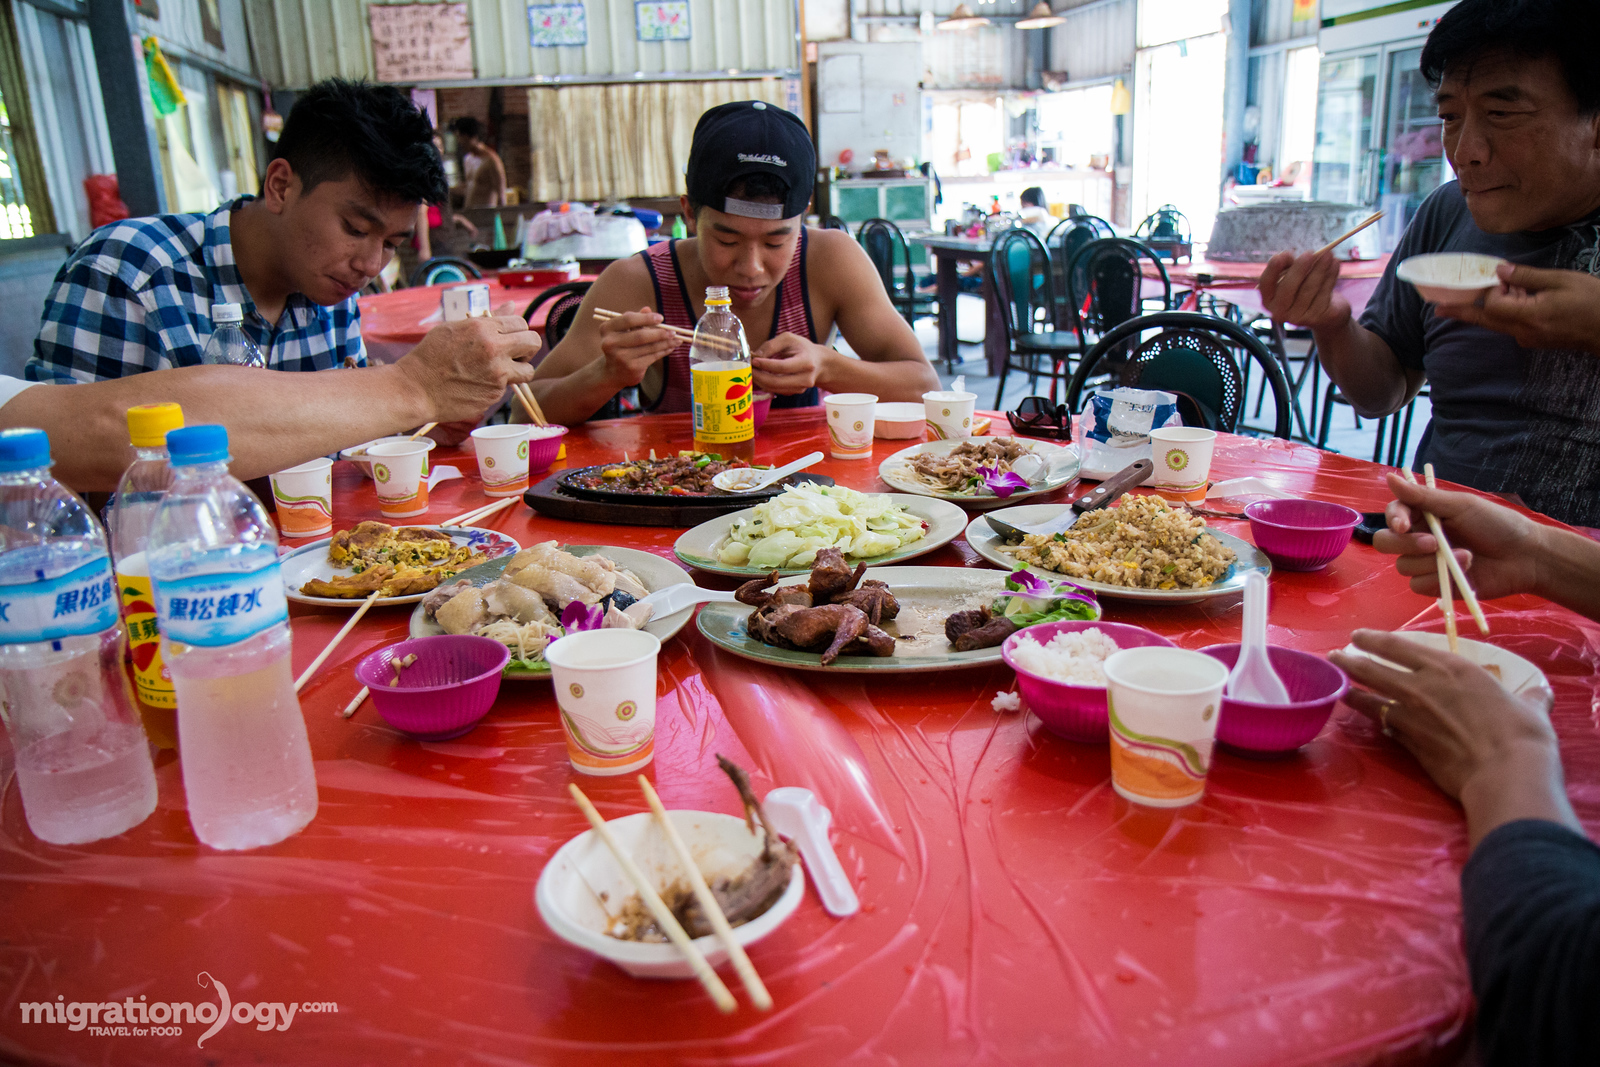 Lunch in Taiwan